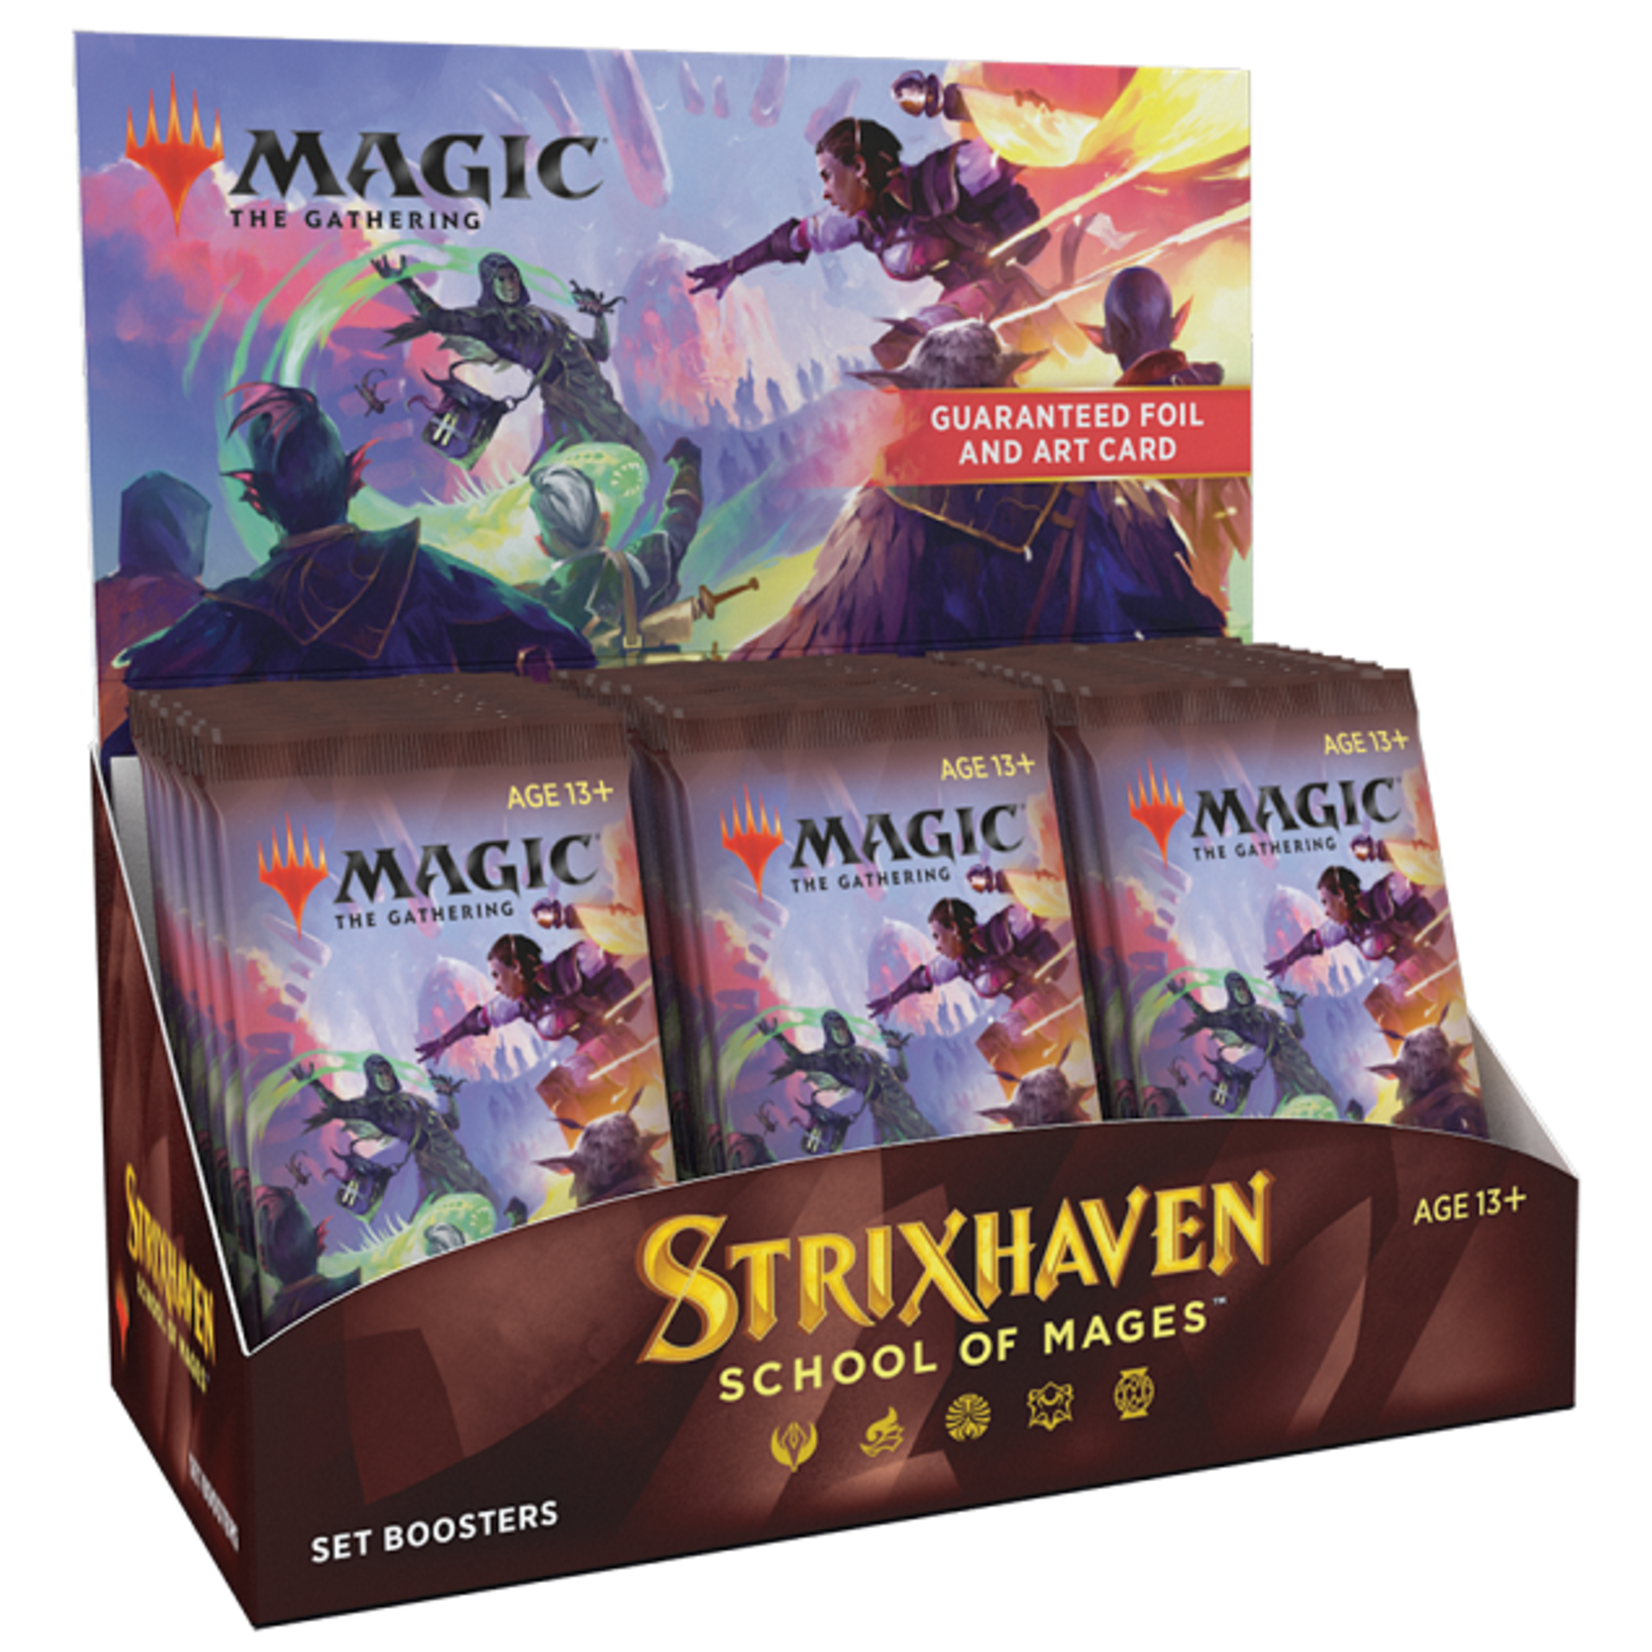 Magic The Gathering MTG Strixhaven Booster Box